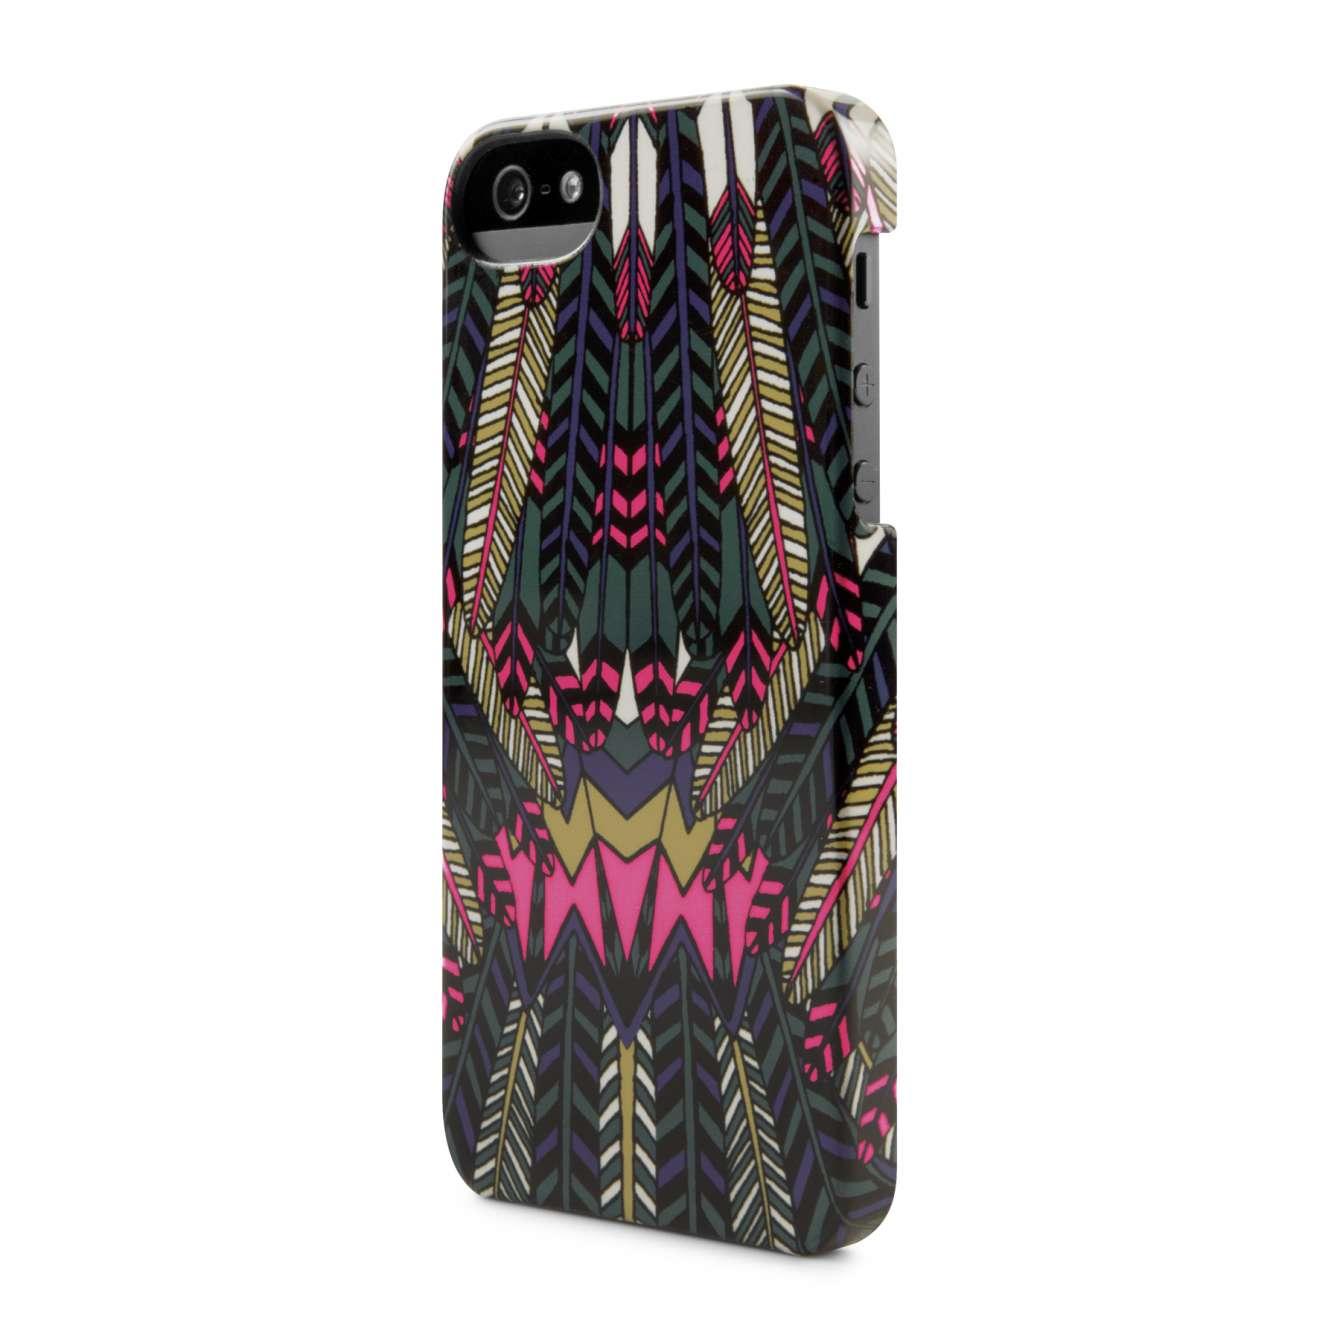 Mara Hoffman x Incase iPhone 5 Snap Cases-5